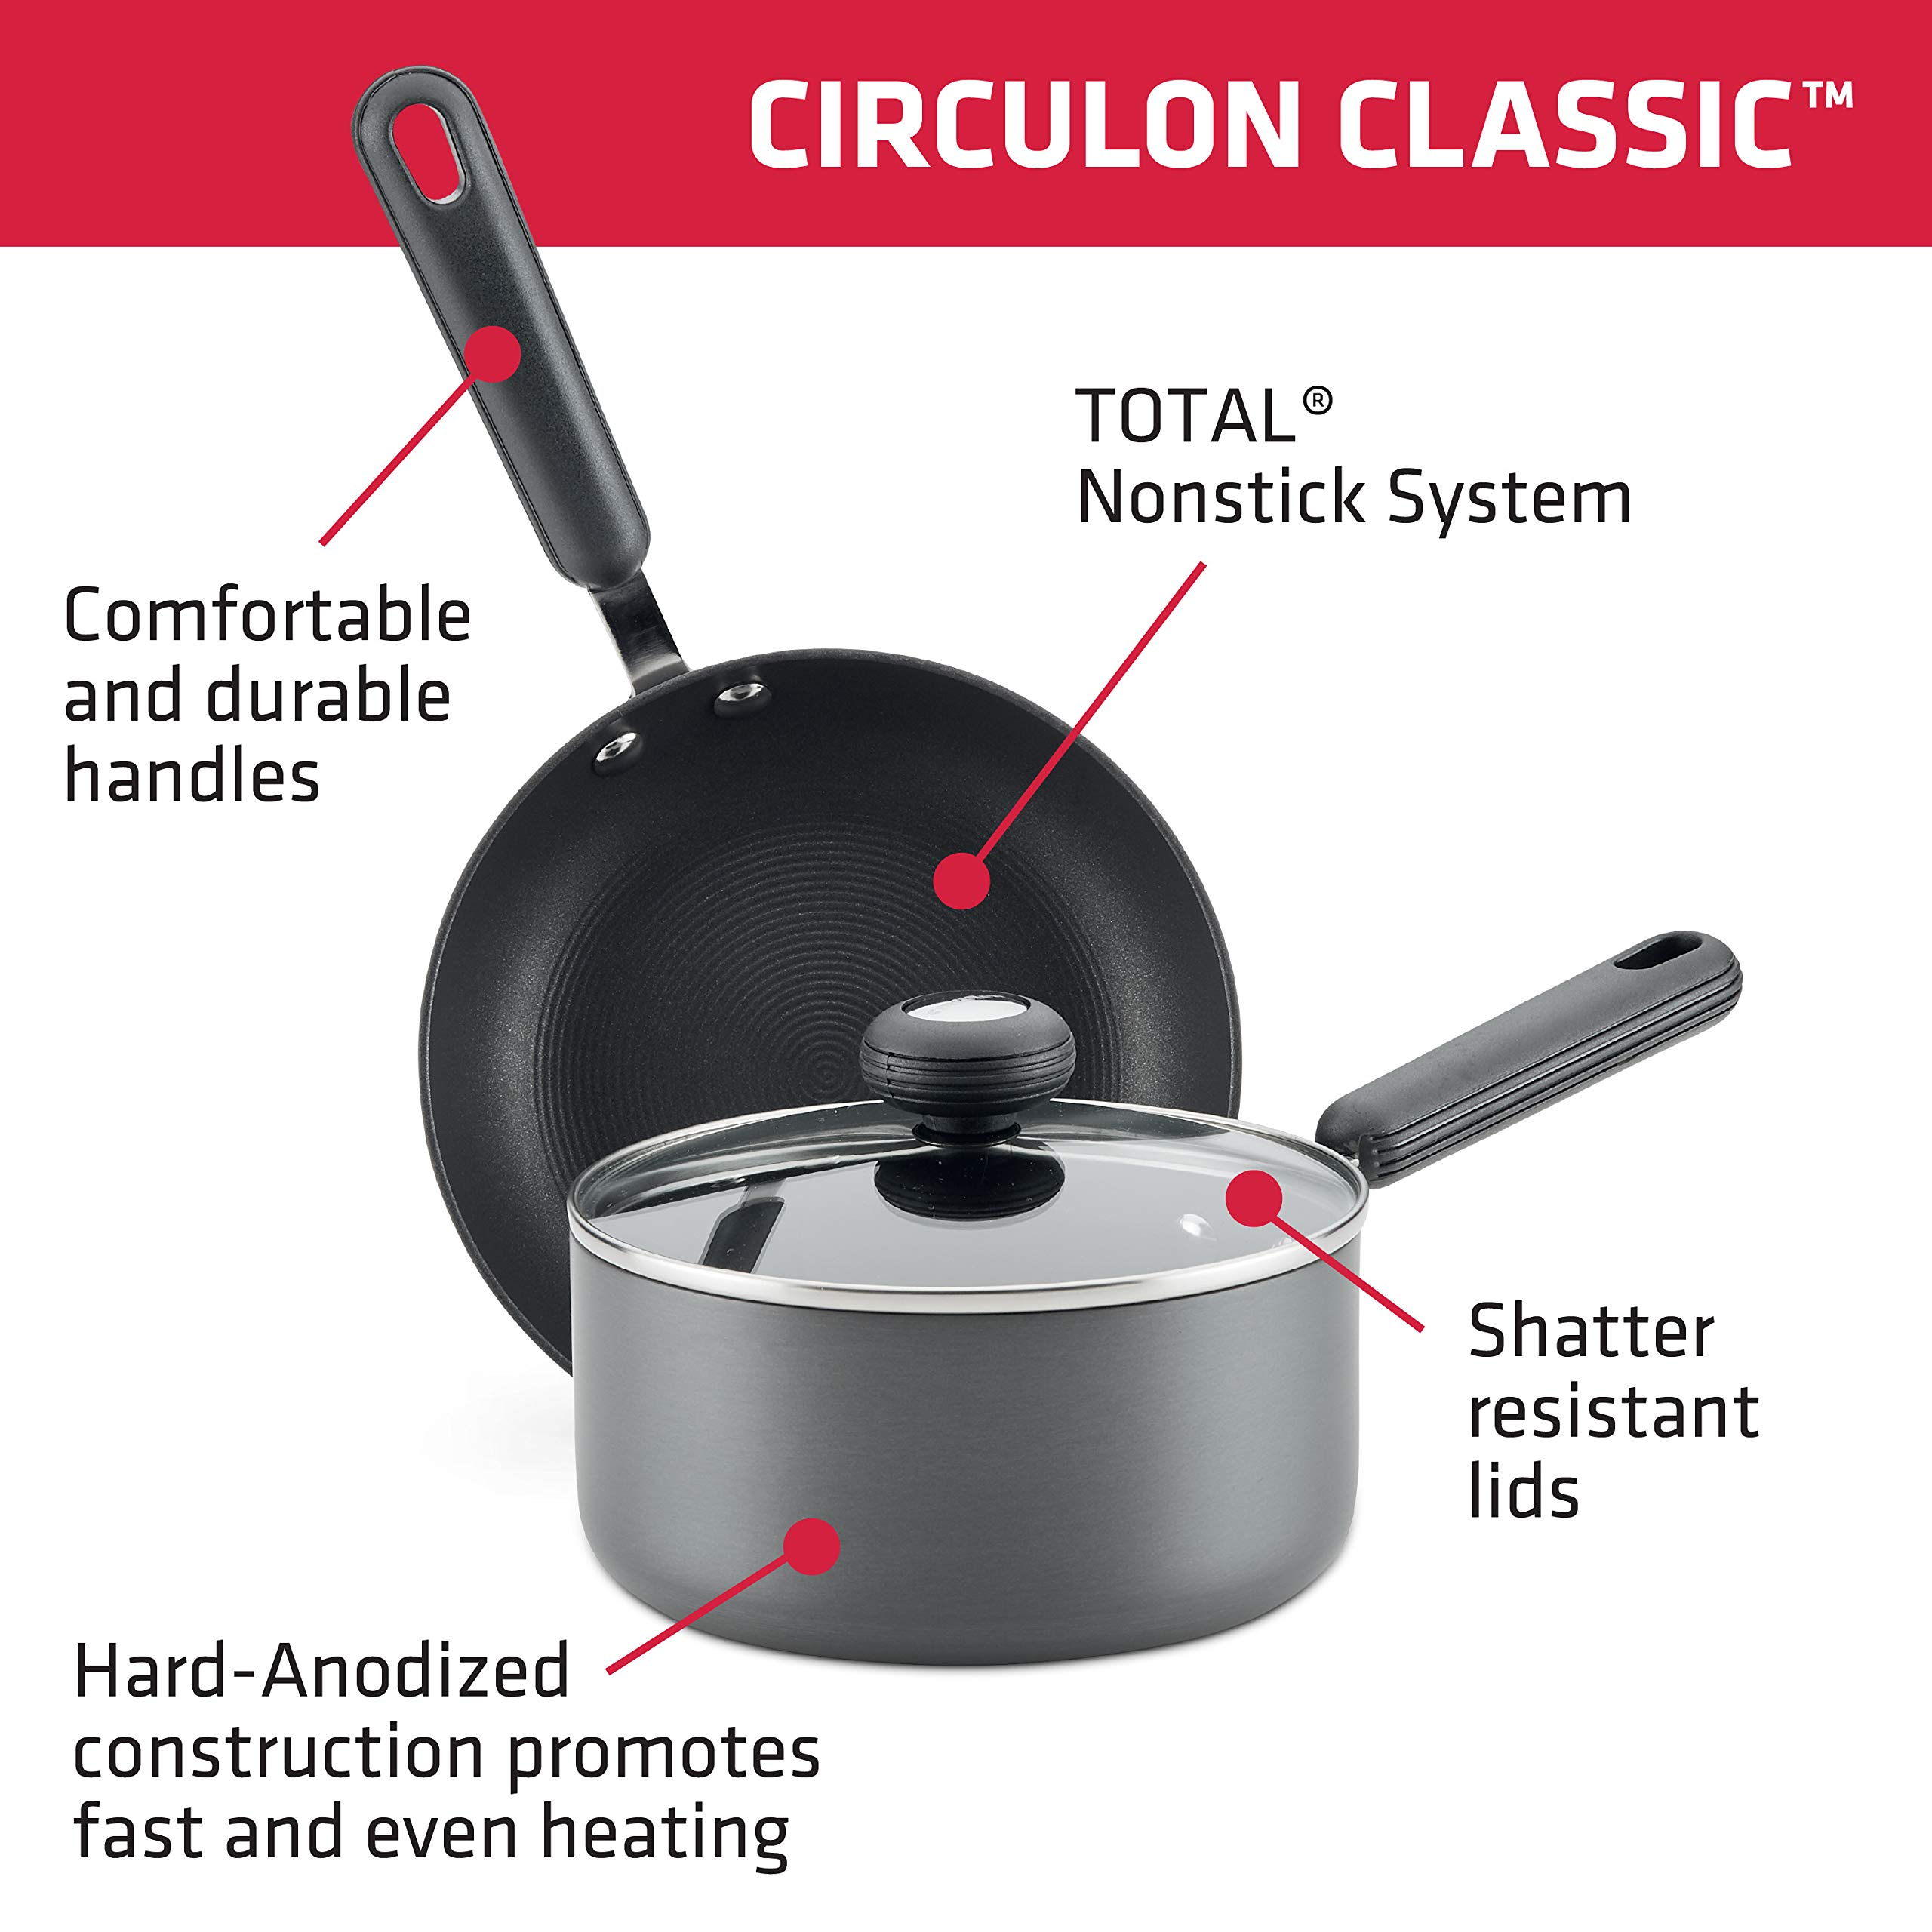 Circulon Classic Hard-Anodized Nonstick Cookware Set, 12-Piece, Gray by Circulon (Image #2)